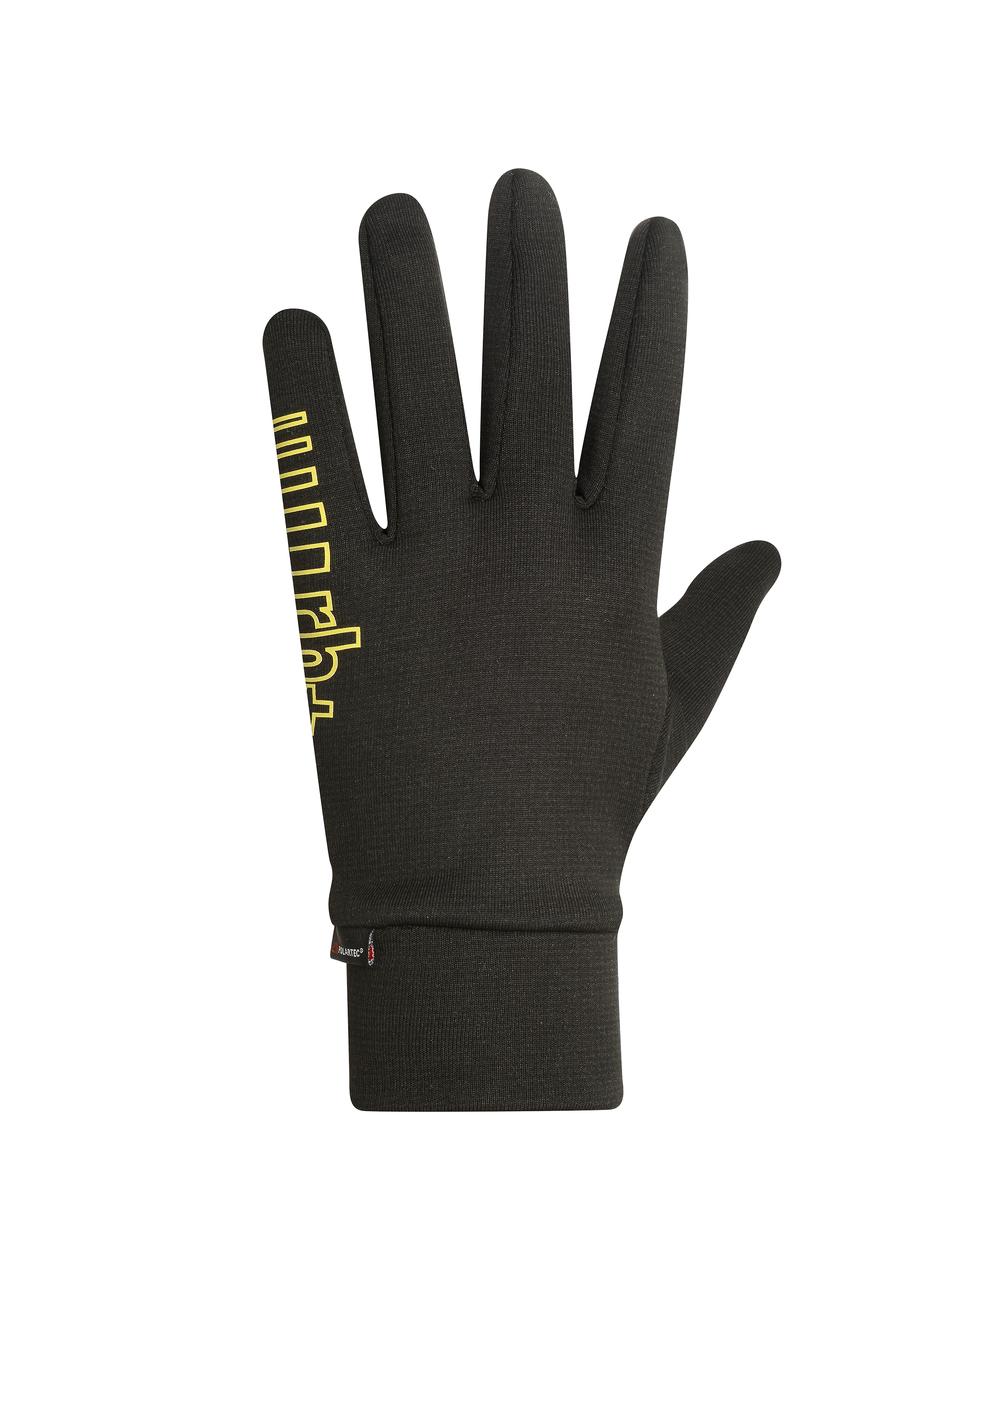 rh+ PW Beta glove.jpg